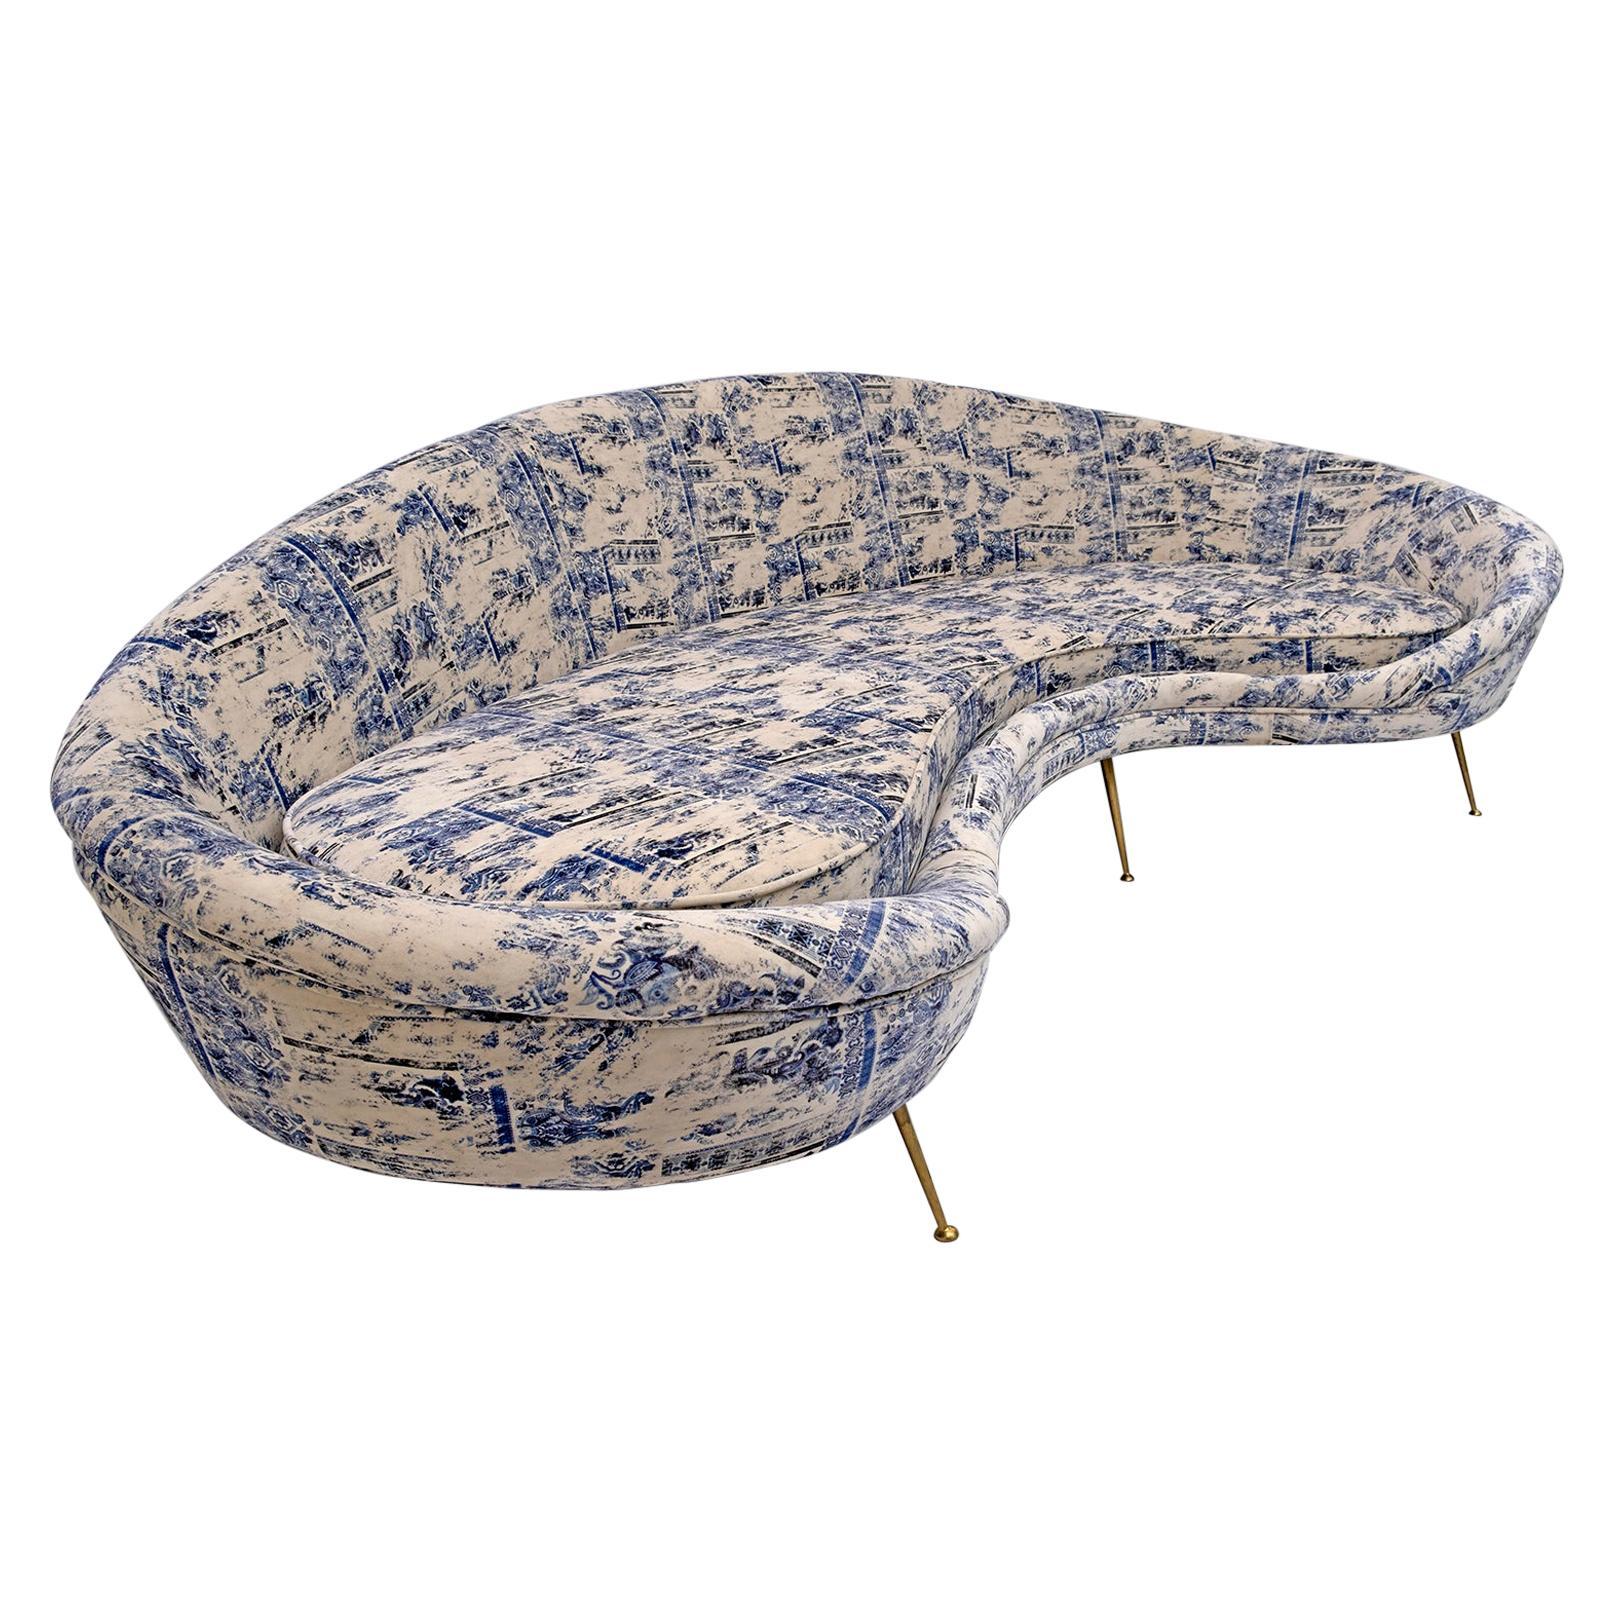 Federico Munari Mid-Century Modern Italian Velvet Curved Sofa, 1950s